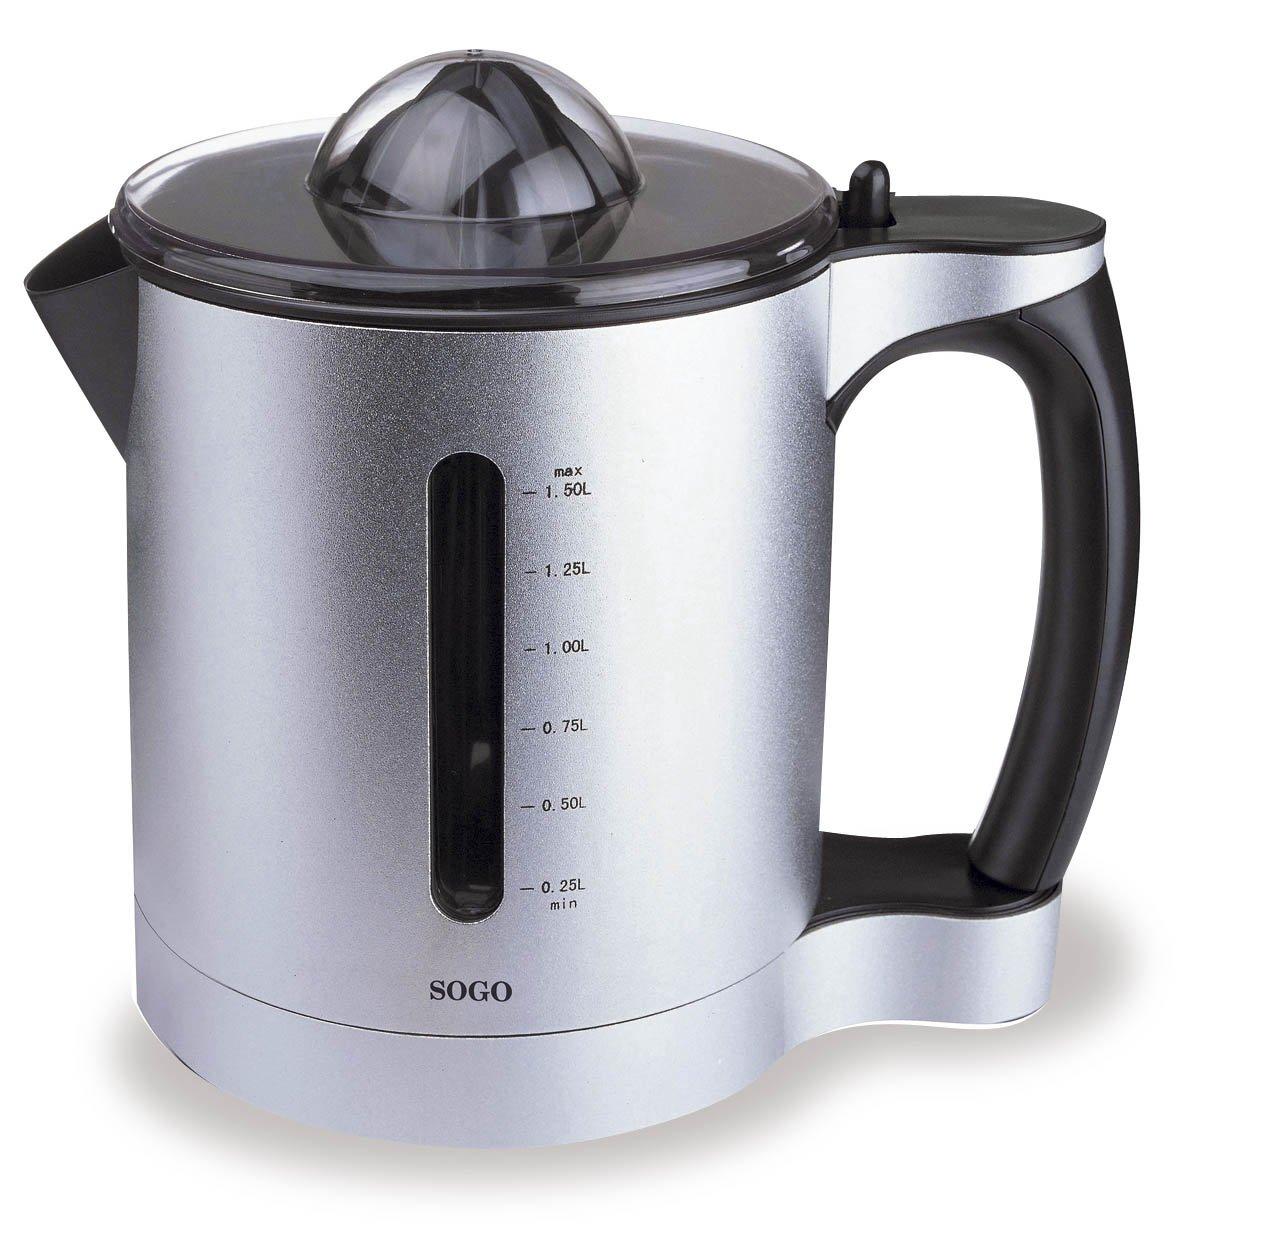 Sogo EXP-SS5201 Exprimidor, 60 W, 1.5 litros, Aluminio: Amazon.es ...